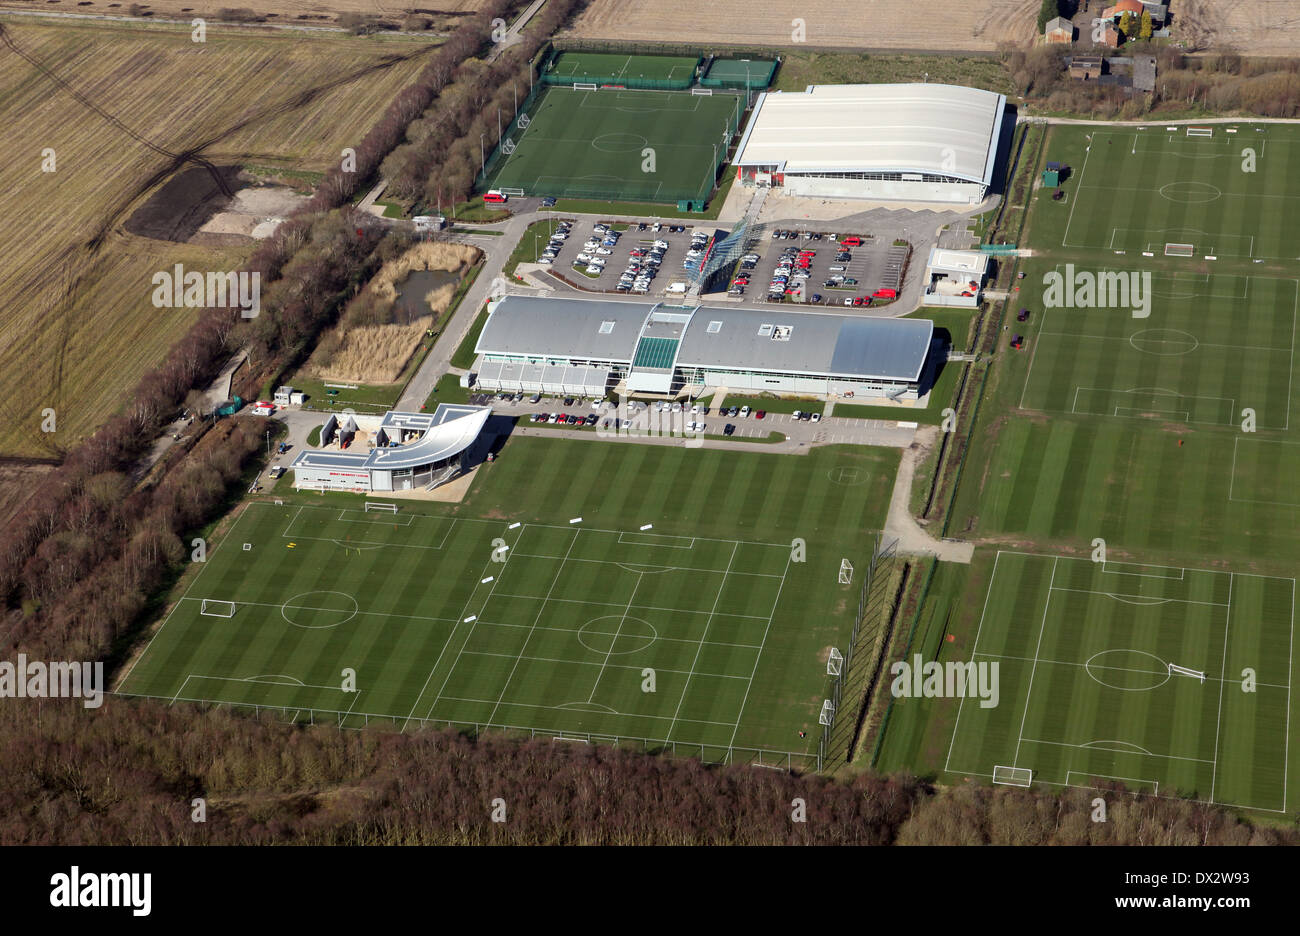 Vista aérea del campo de entrenamiento de fútbol Manchester United en Carrington, Manchester Imagen De Stock